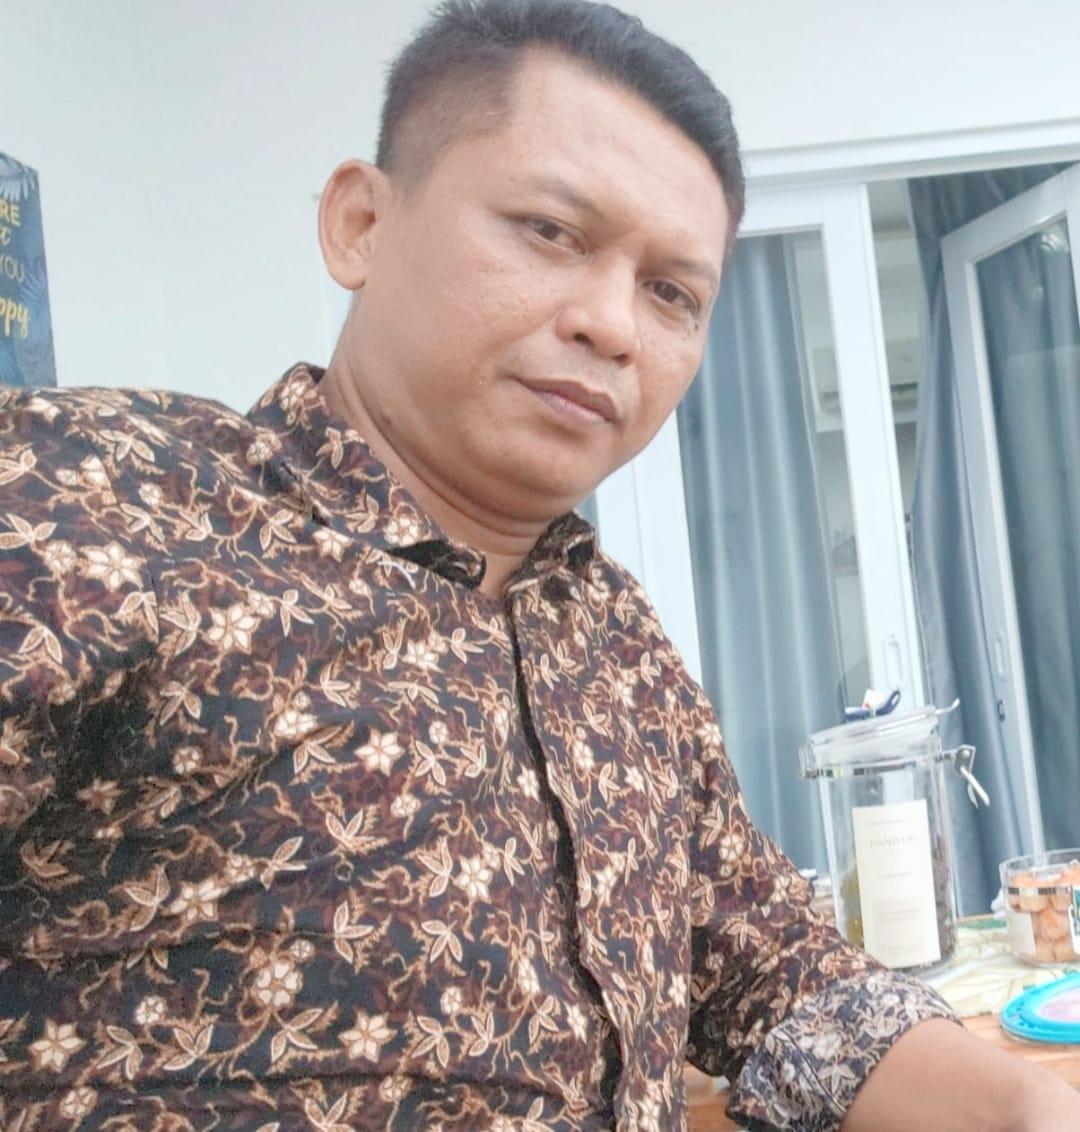 Gambar Pimpinan Advokasi Hukum MOI Pandeglang: Kami Siap Turun Bila Anggota MOI Berbenturan 11